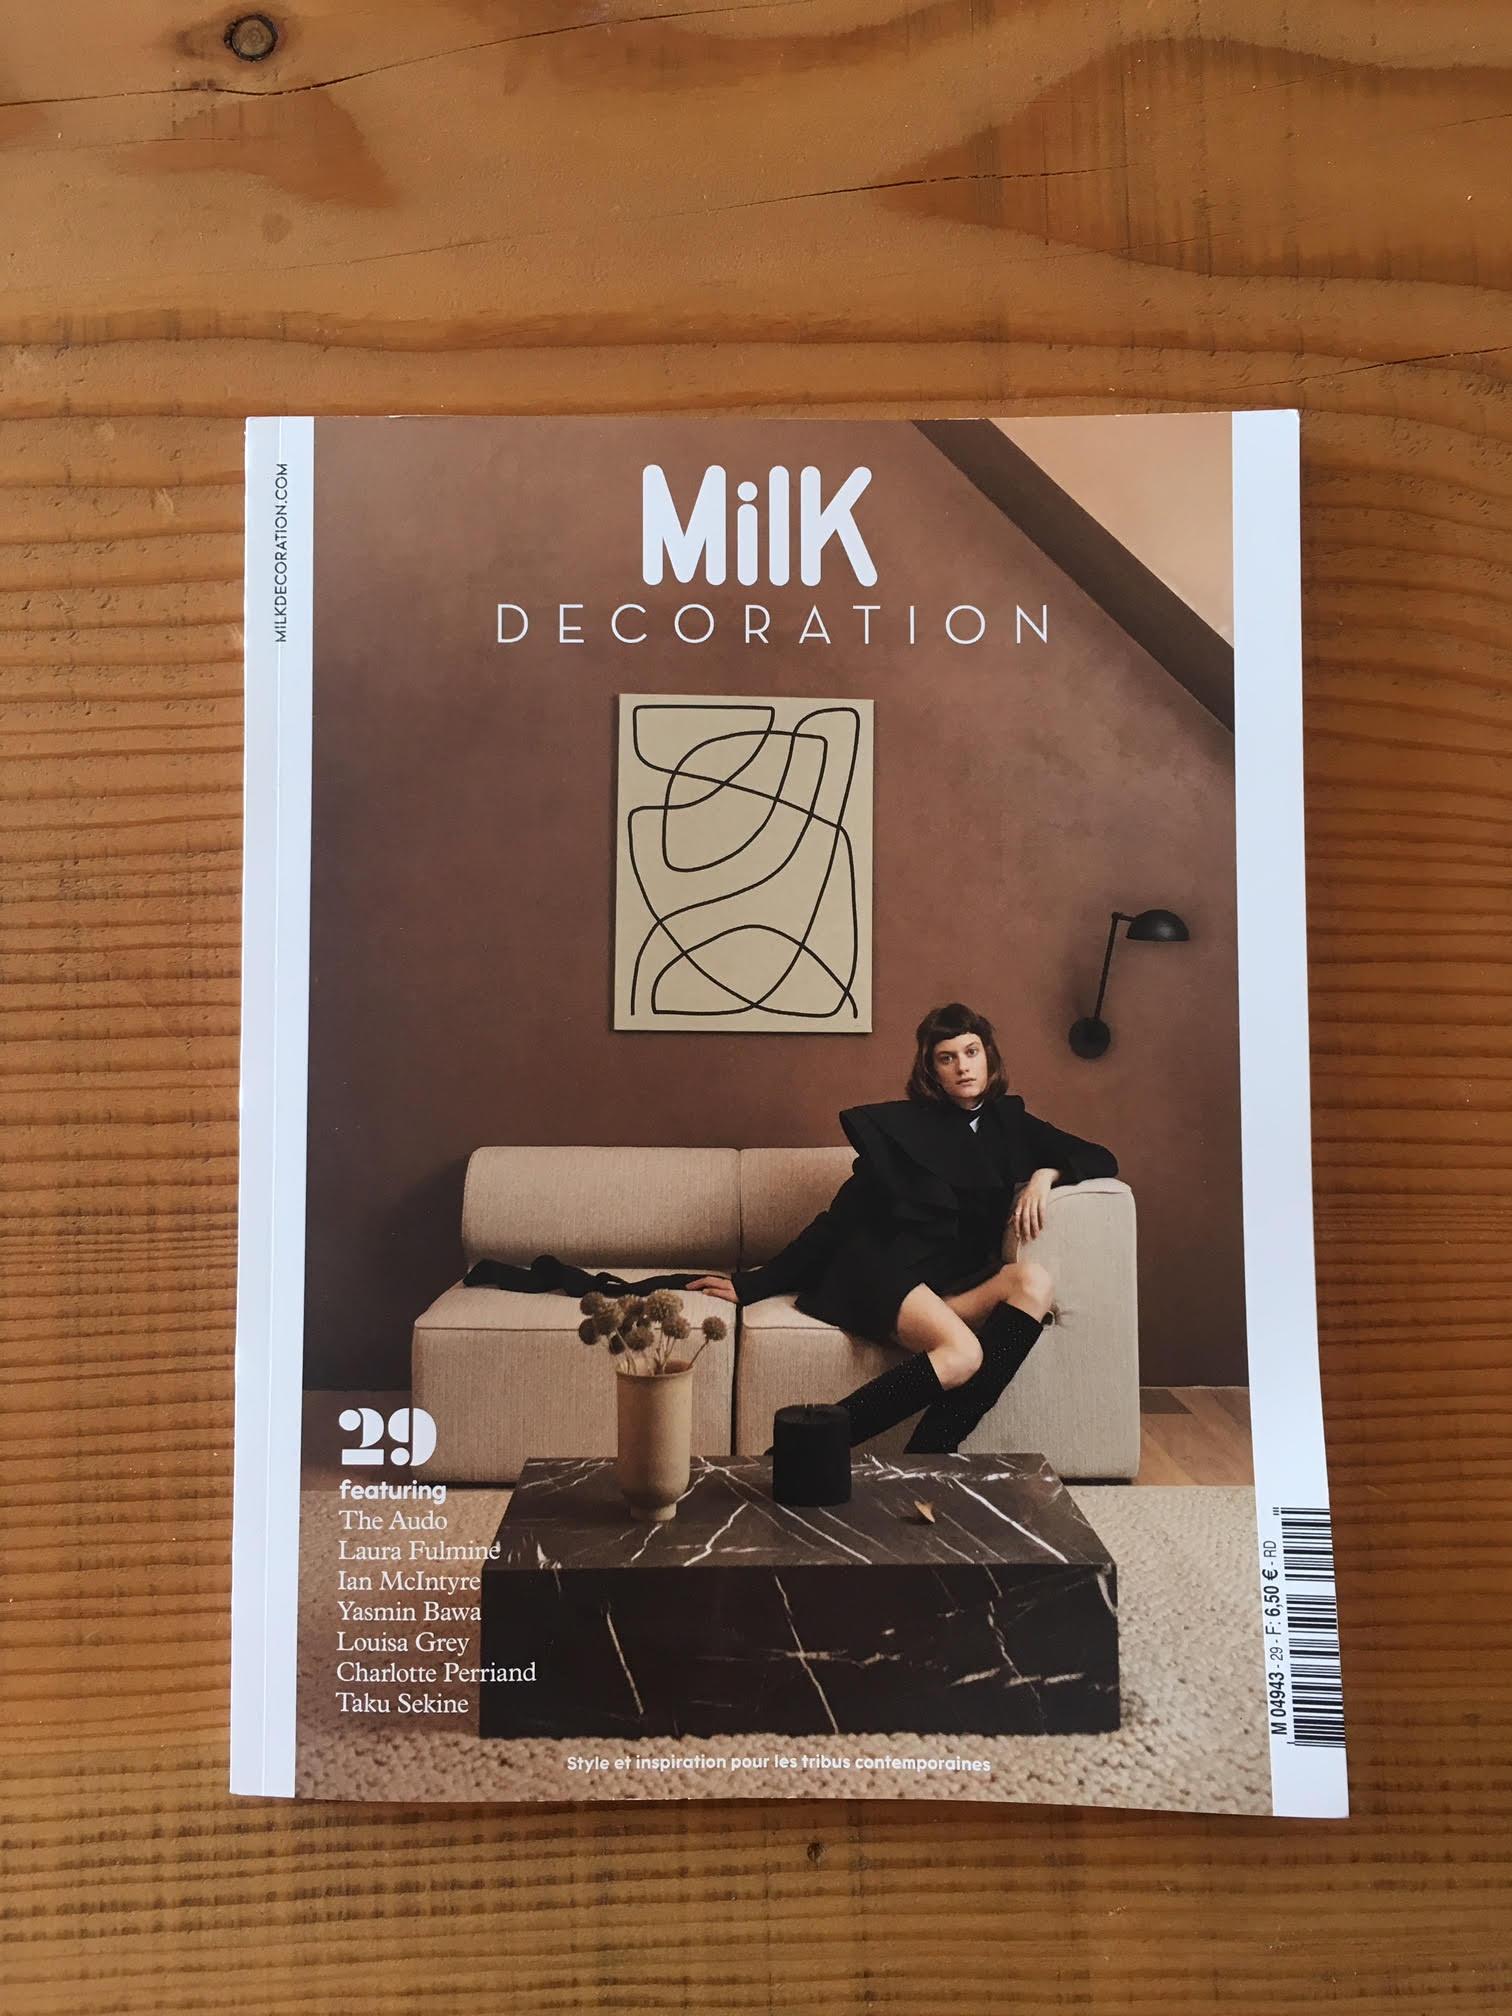 Milk-decoration_septembre2019.jpg